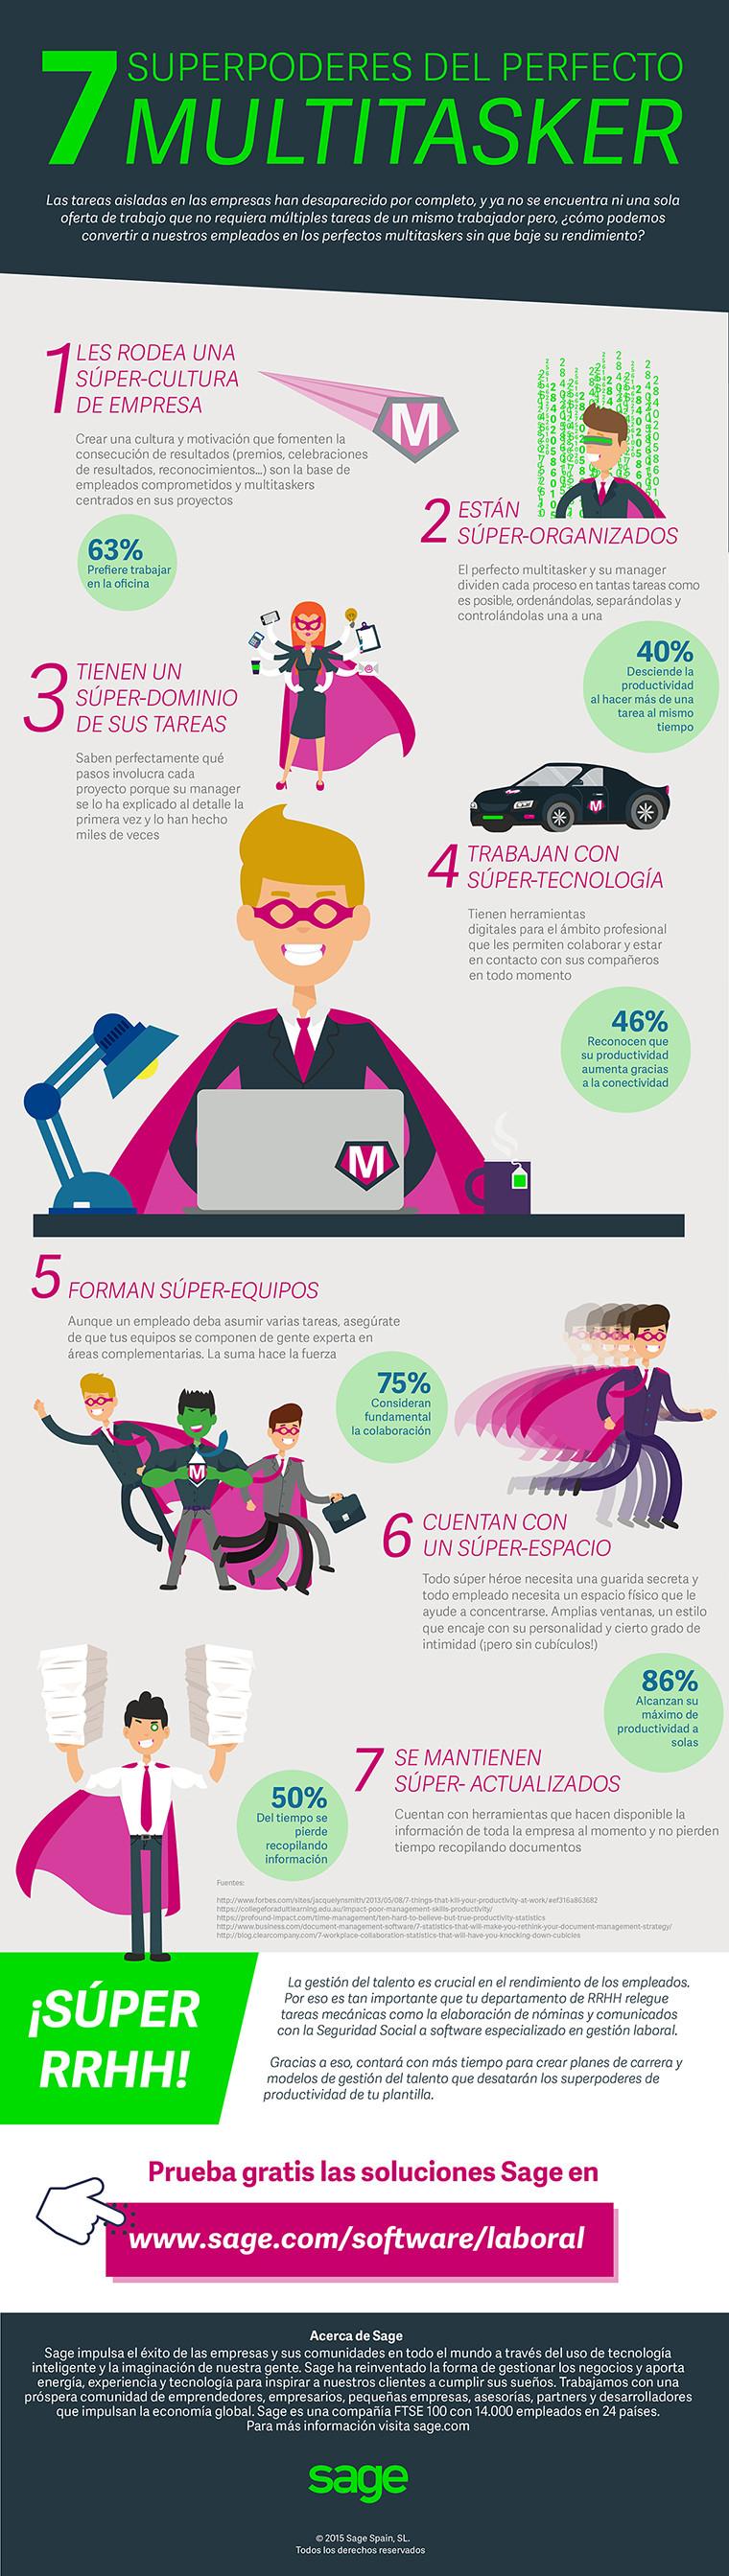 7 superpoderes del perfecto multitasker